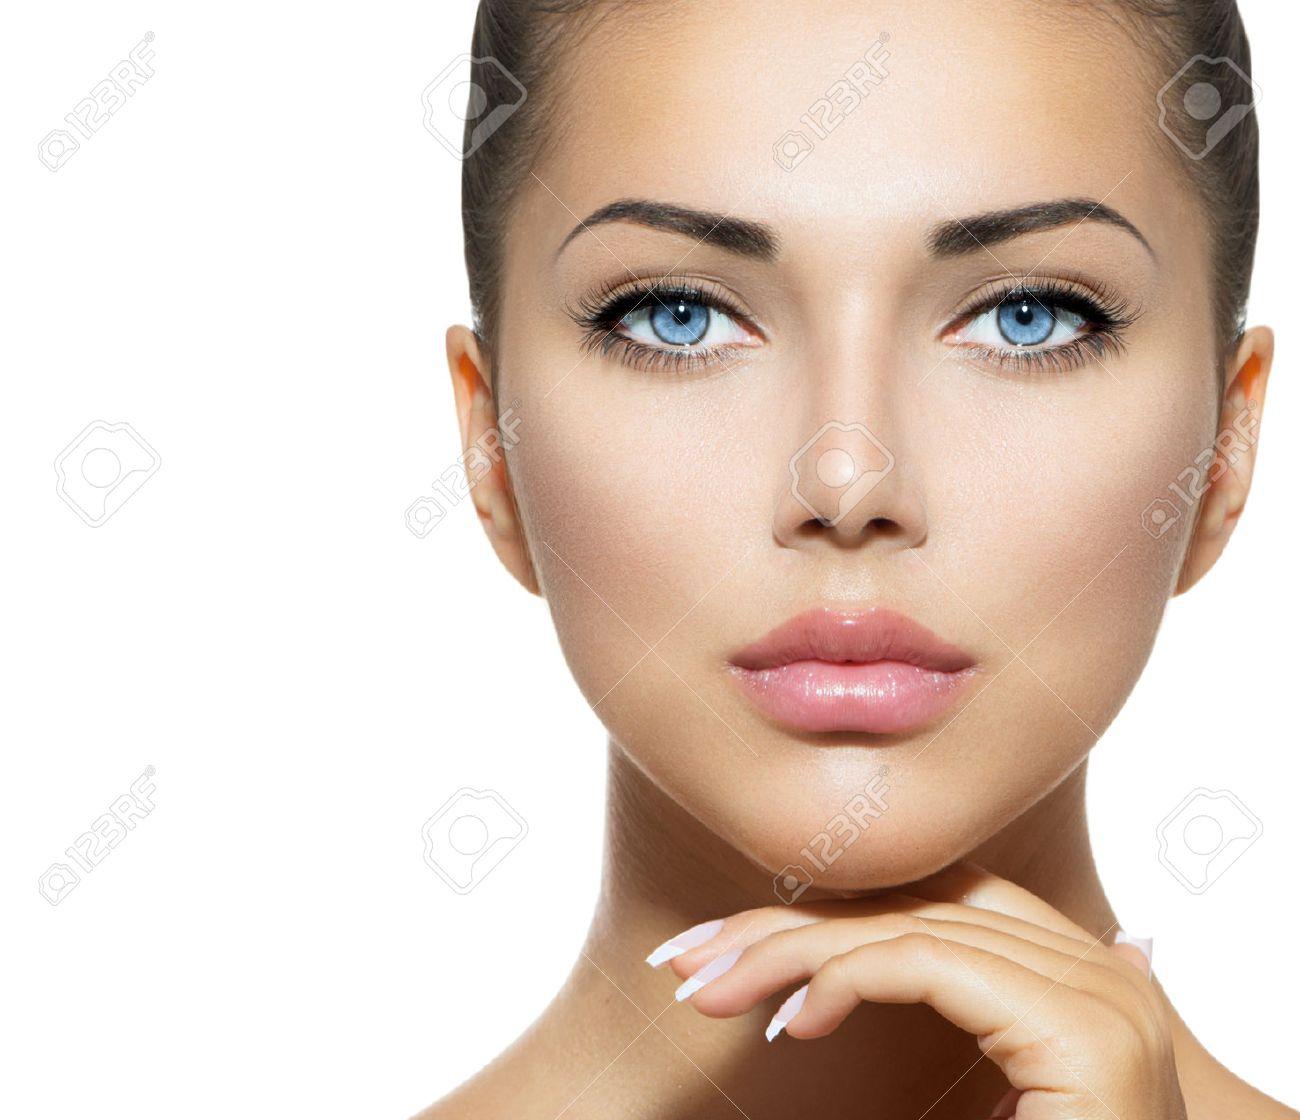 Beauty Portrait  Beautiful Spa Woman Touching her Face Stock Photo - 22997372